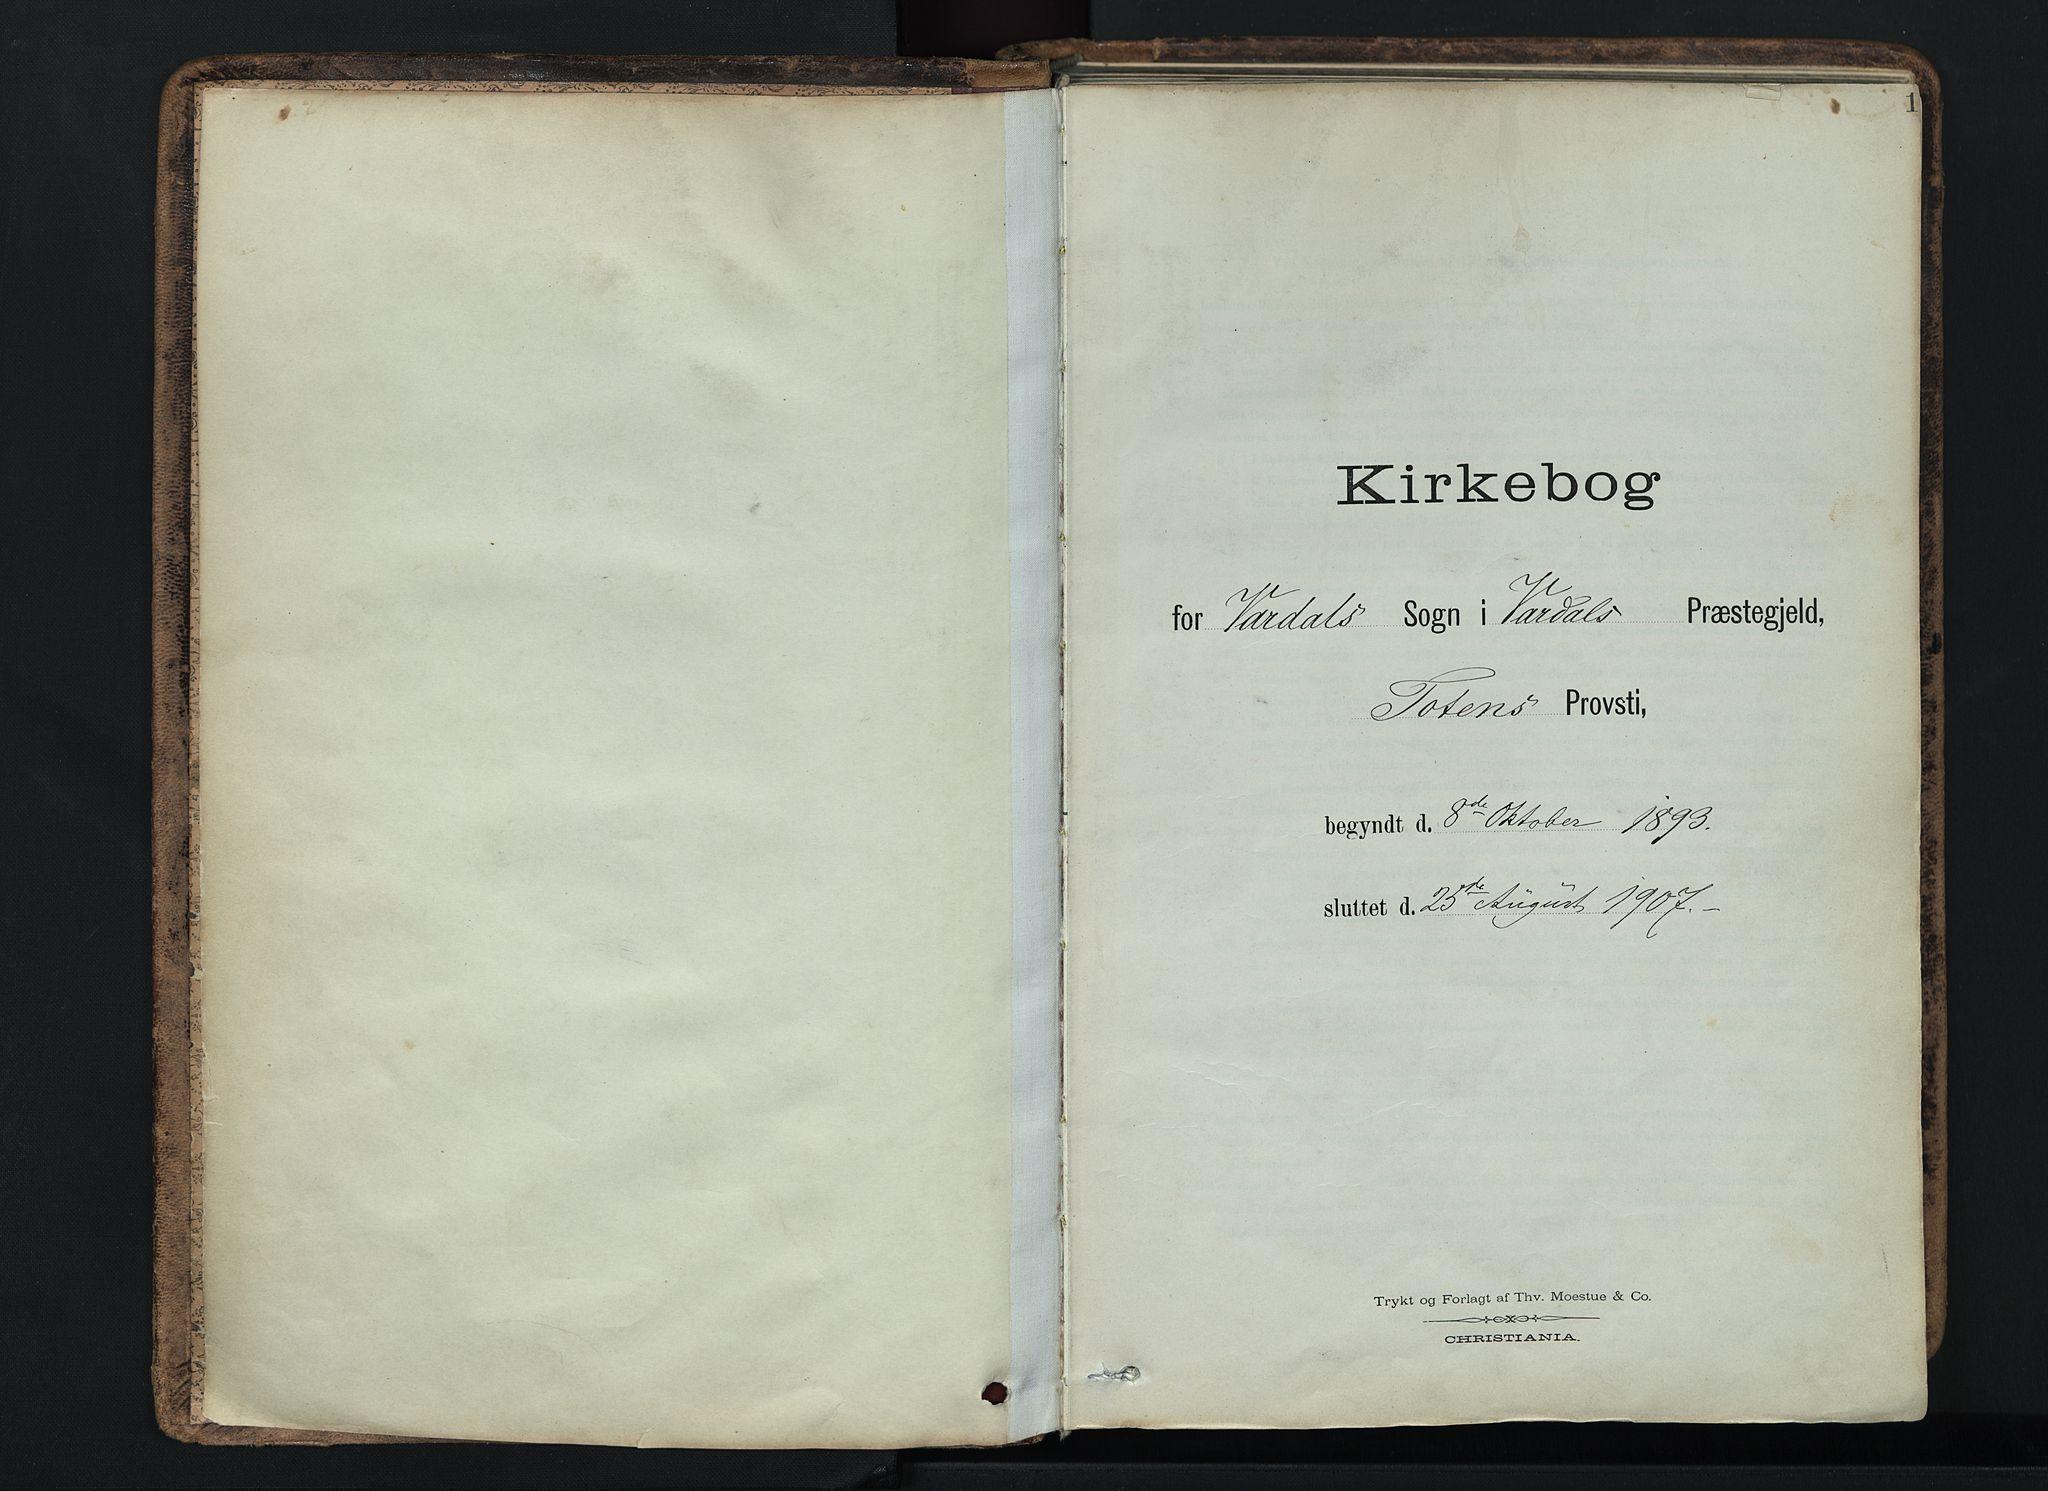 SAH, Vardal prestekontor, H/Ha/Haa/L0019: Ministerialbok nr. 19, 1893-1907, s. 1